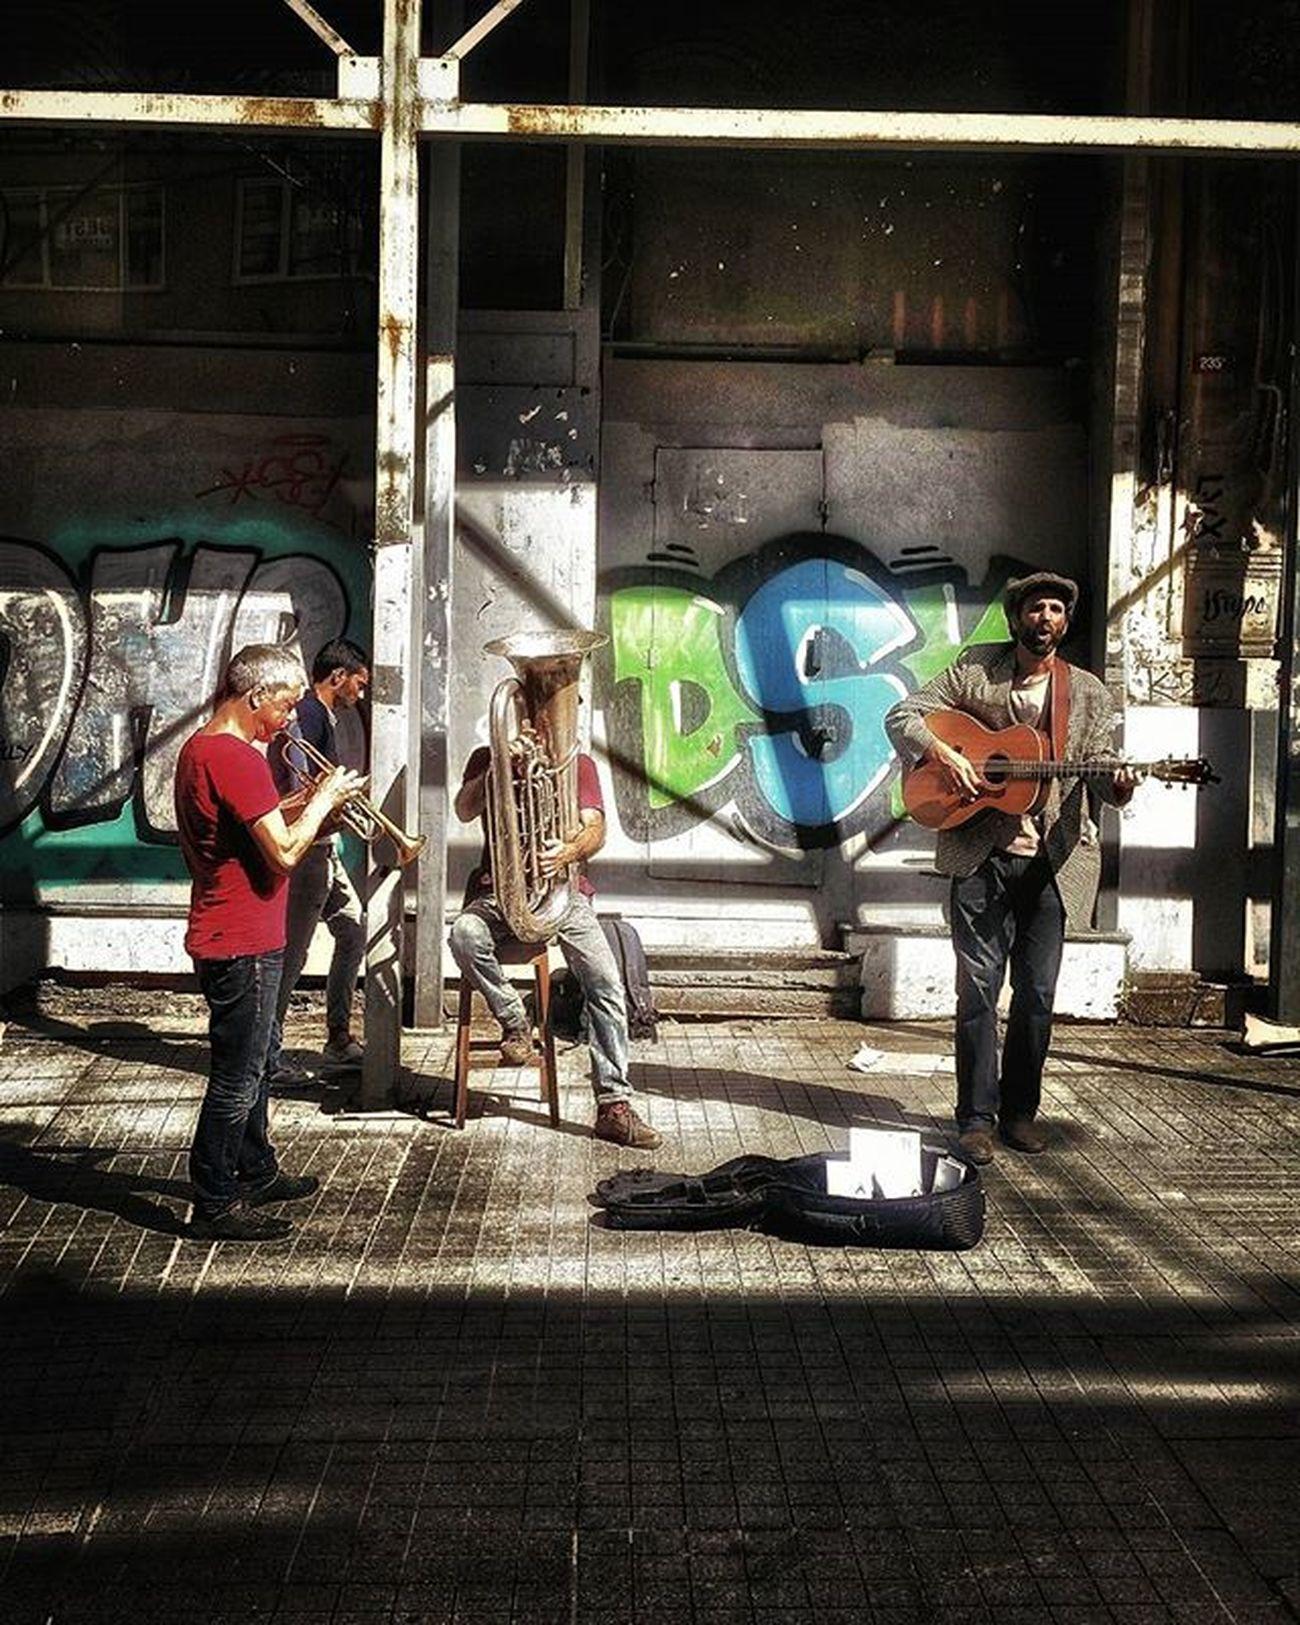 mayıs 2016... Photographercanokkali Amateurphotography Photographer Music MusicIsLife Streetphotography Istanbuldayasam Istanbul